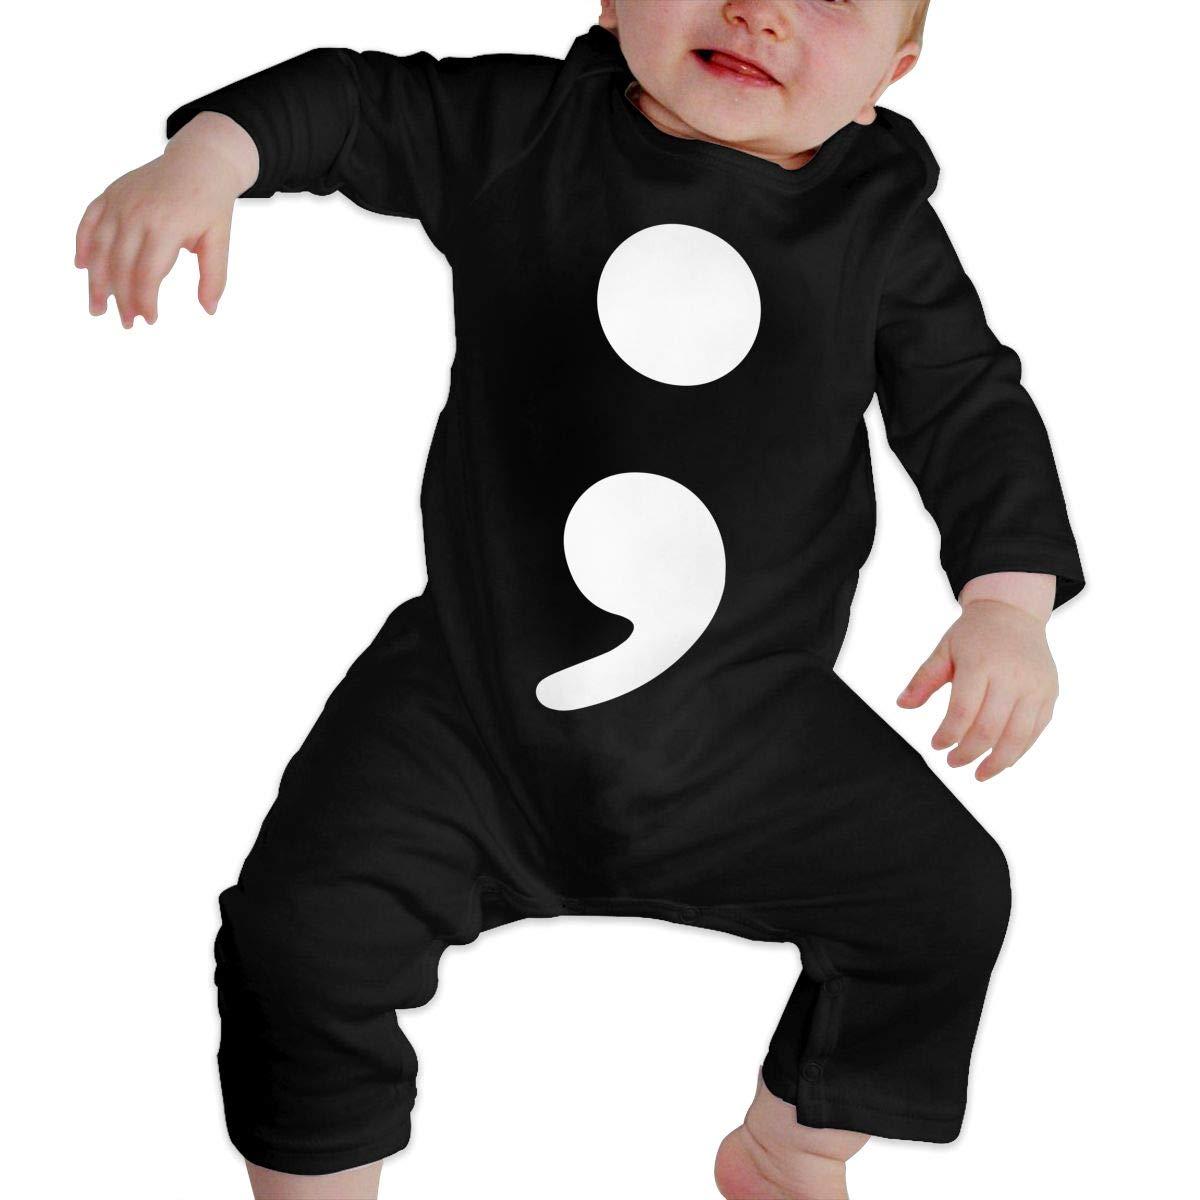 U99oi-9 Long Sleeve Cotton Bodysuit for Baby Girls Boys Fashion Semi Colon Crawler